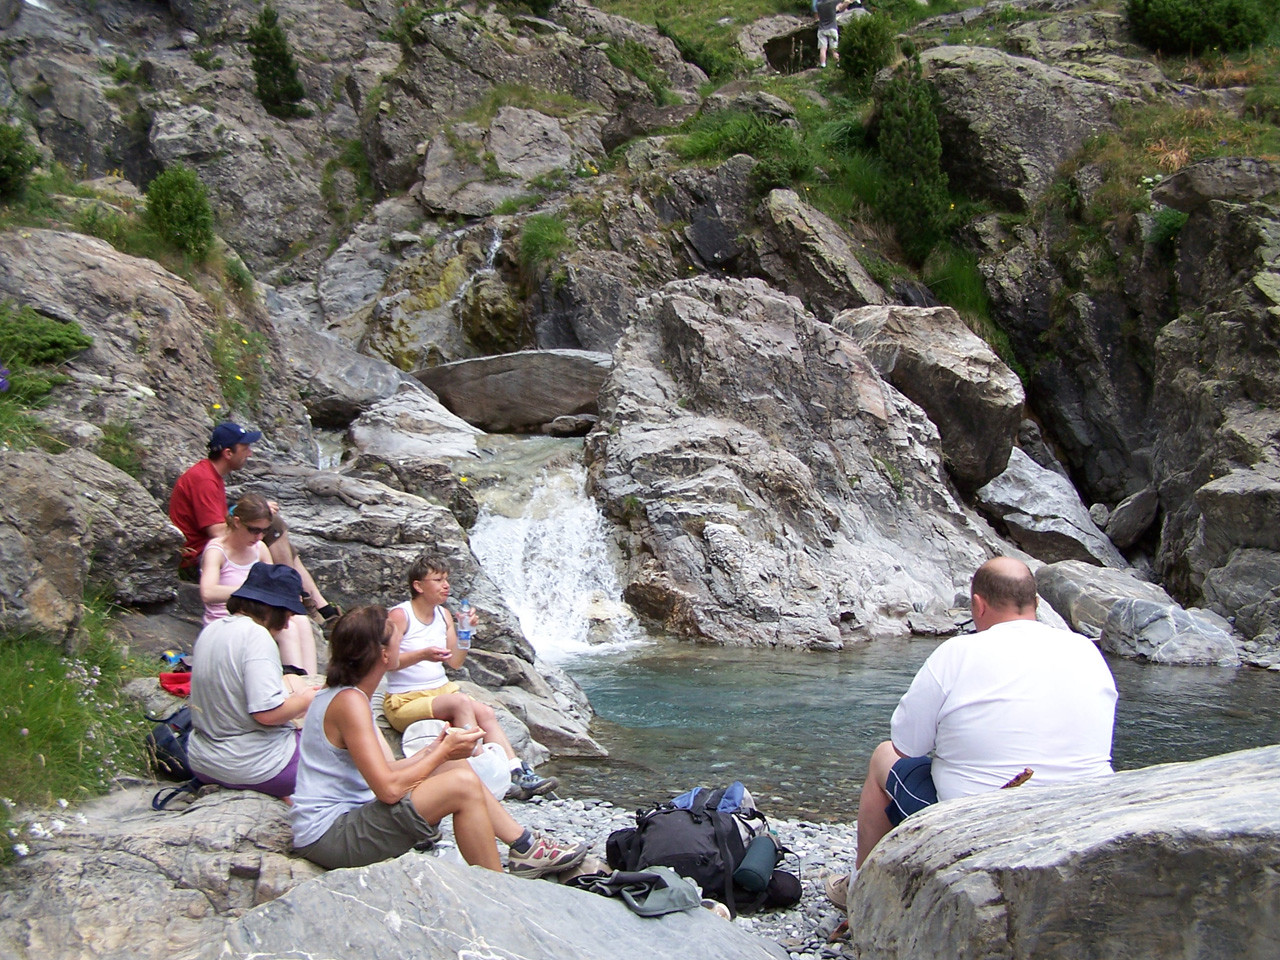 Pique-nique au bord de l'eau vallée de Pineta